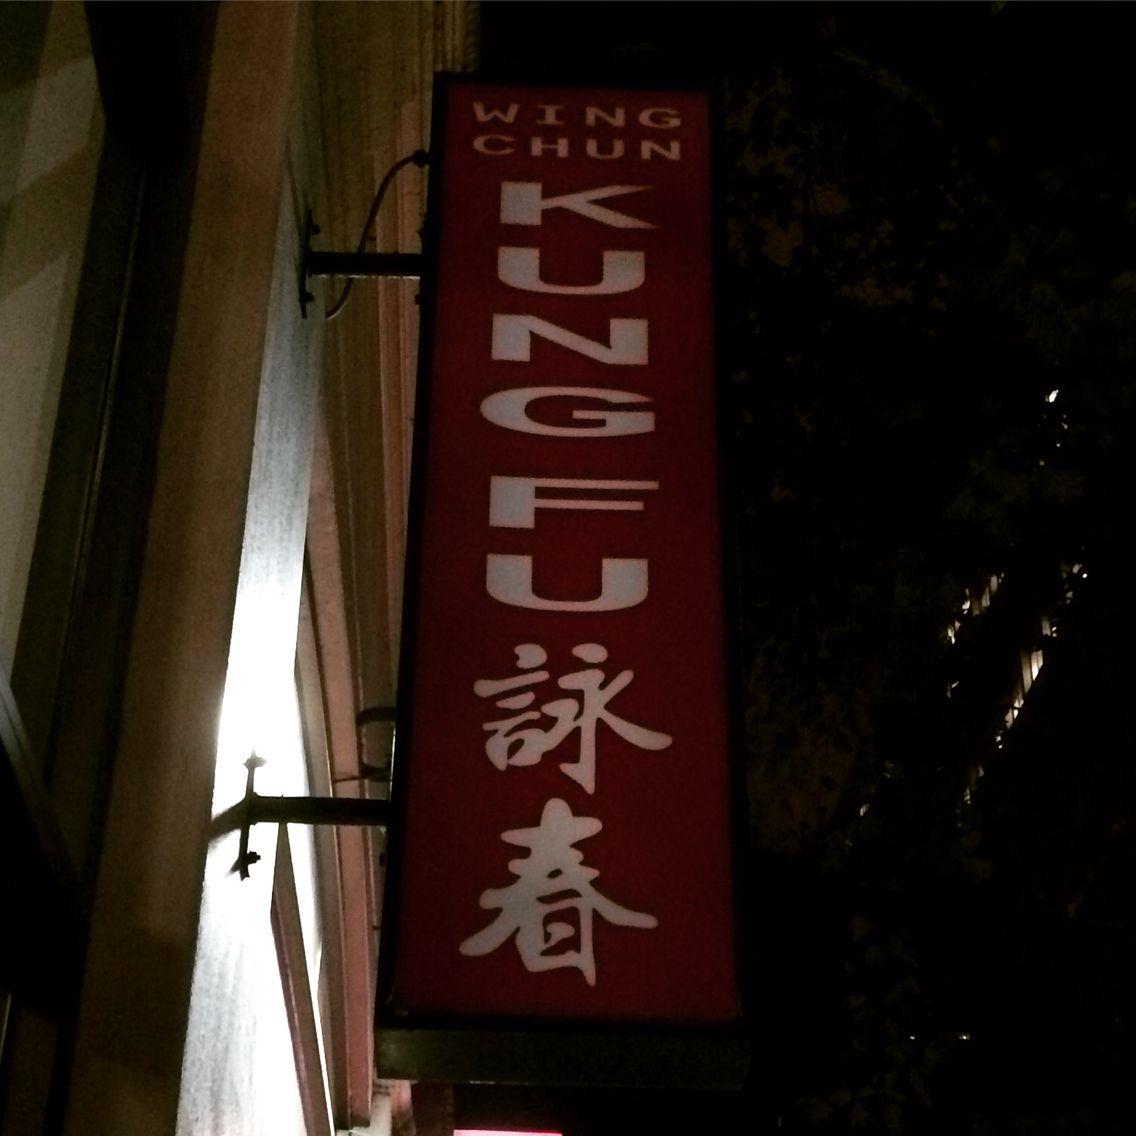 Grandmaster William Cheung's Wing Chun Kung Fu Academy in Melbourne Australia